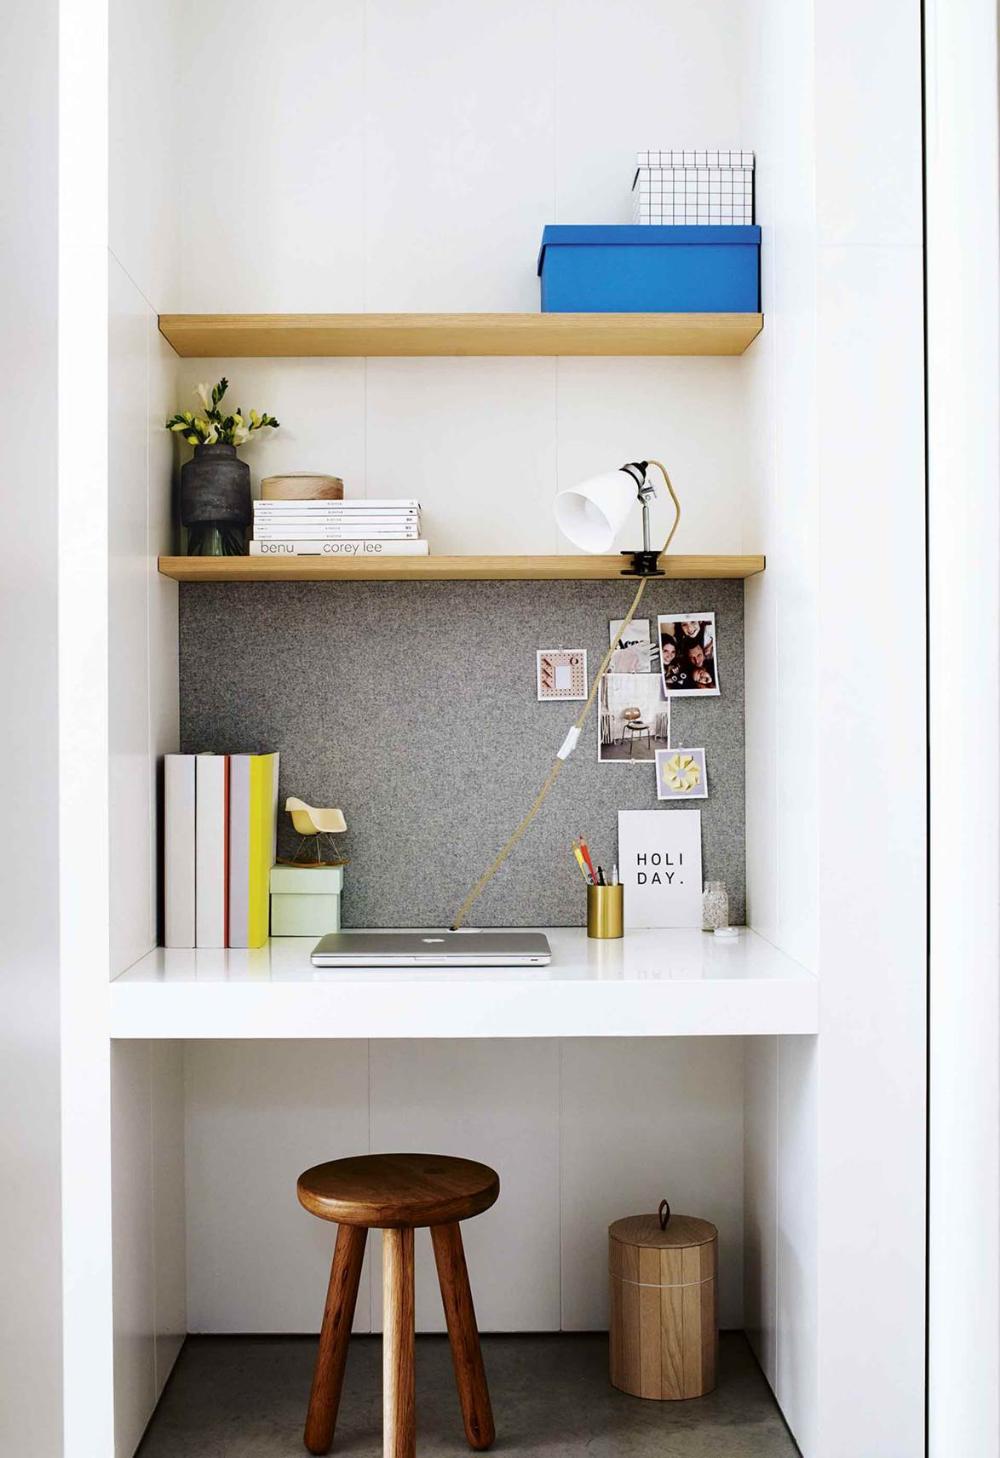 12 Study Nook Ideas For Your Home Home Office Design Desk Nook Study Nook